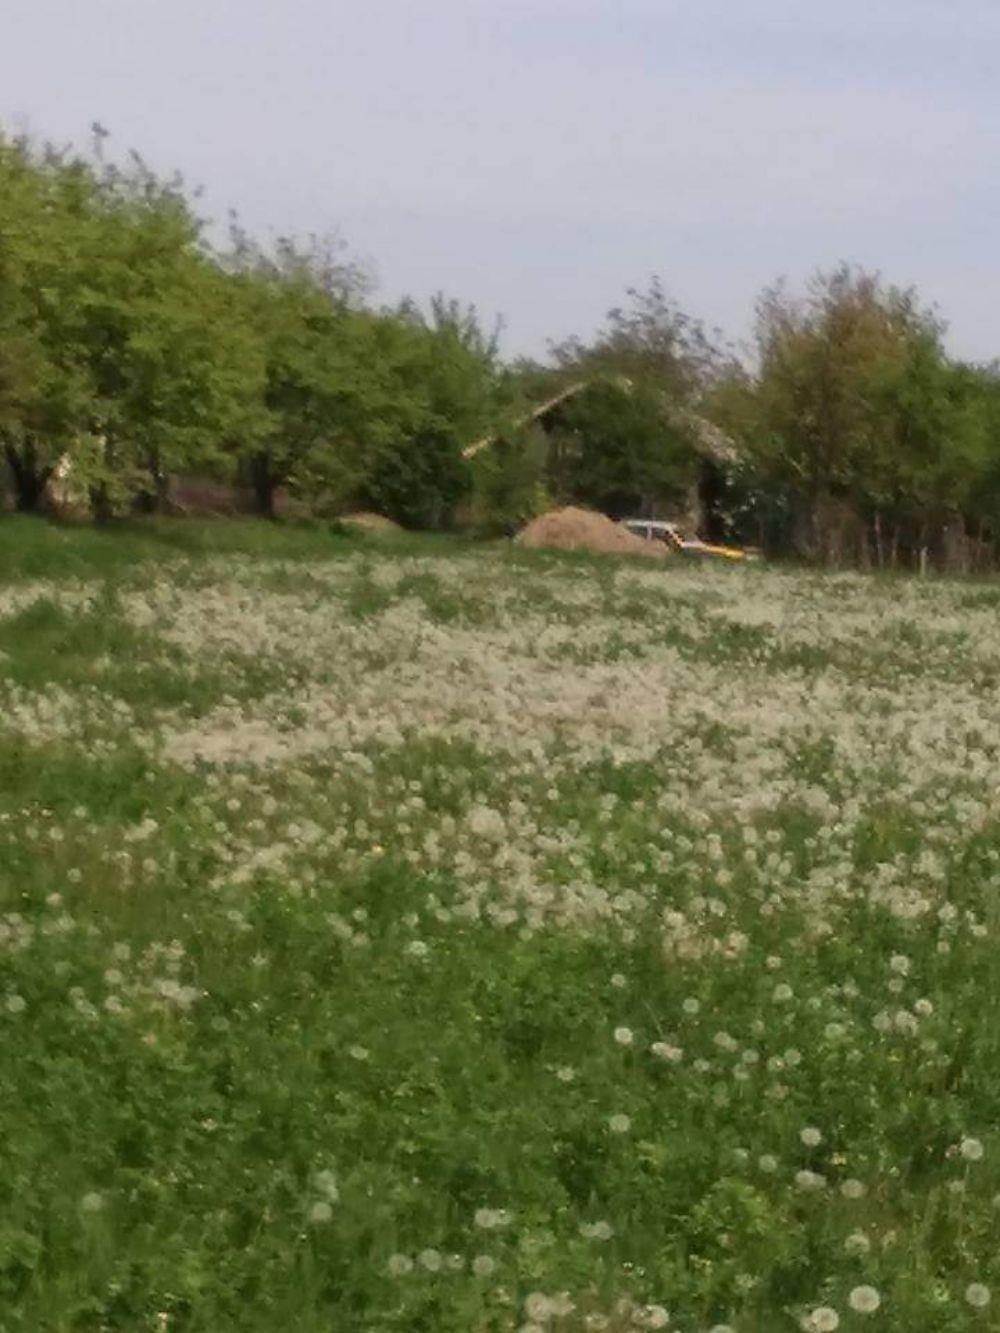 Teren Comuna Gruiu, sat Santu-Floresti - imagine 1